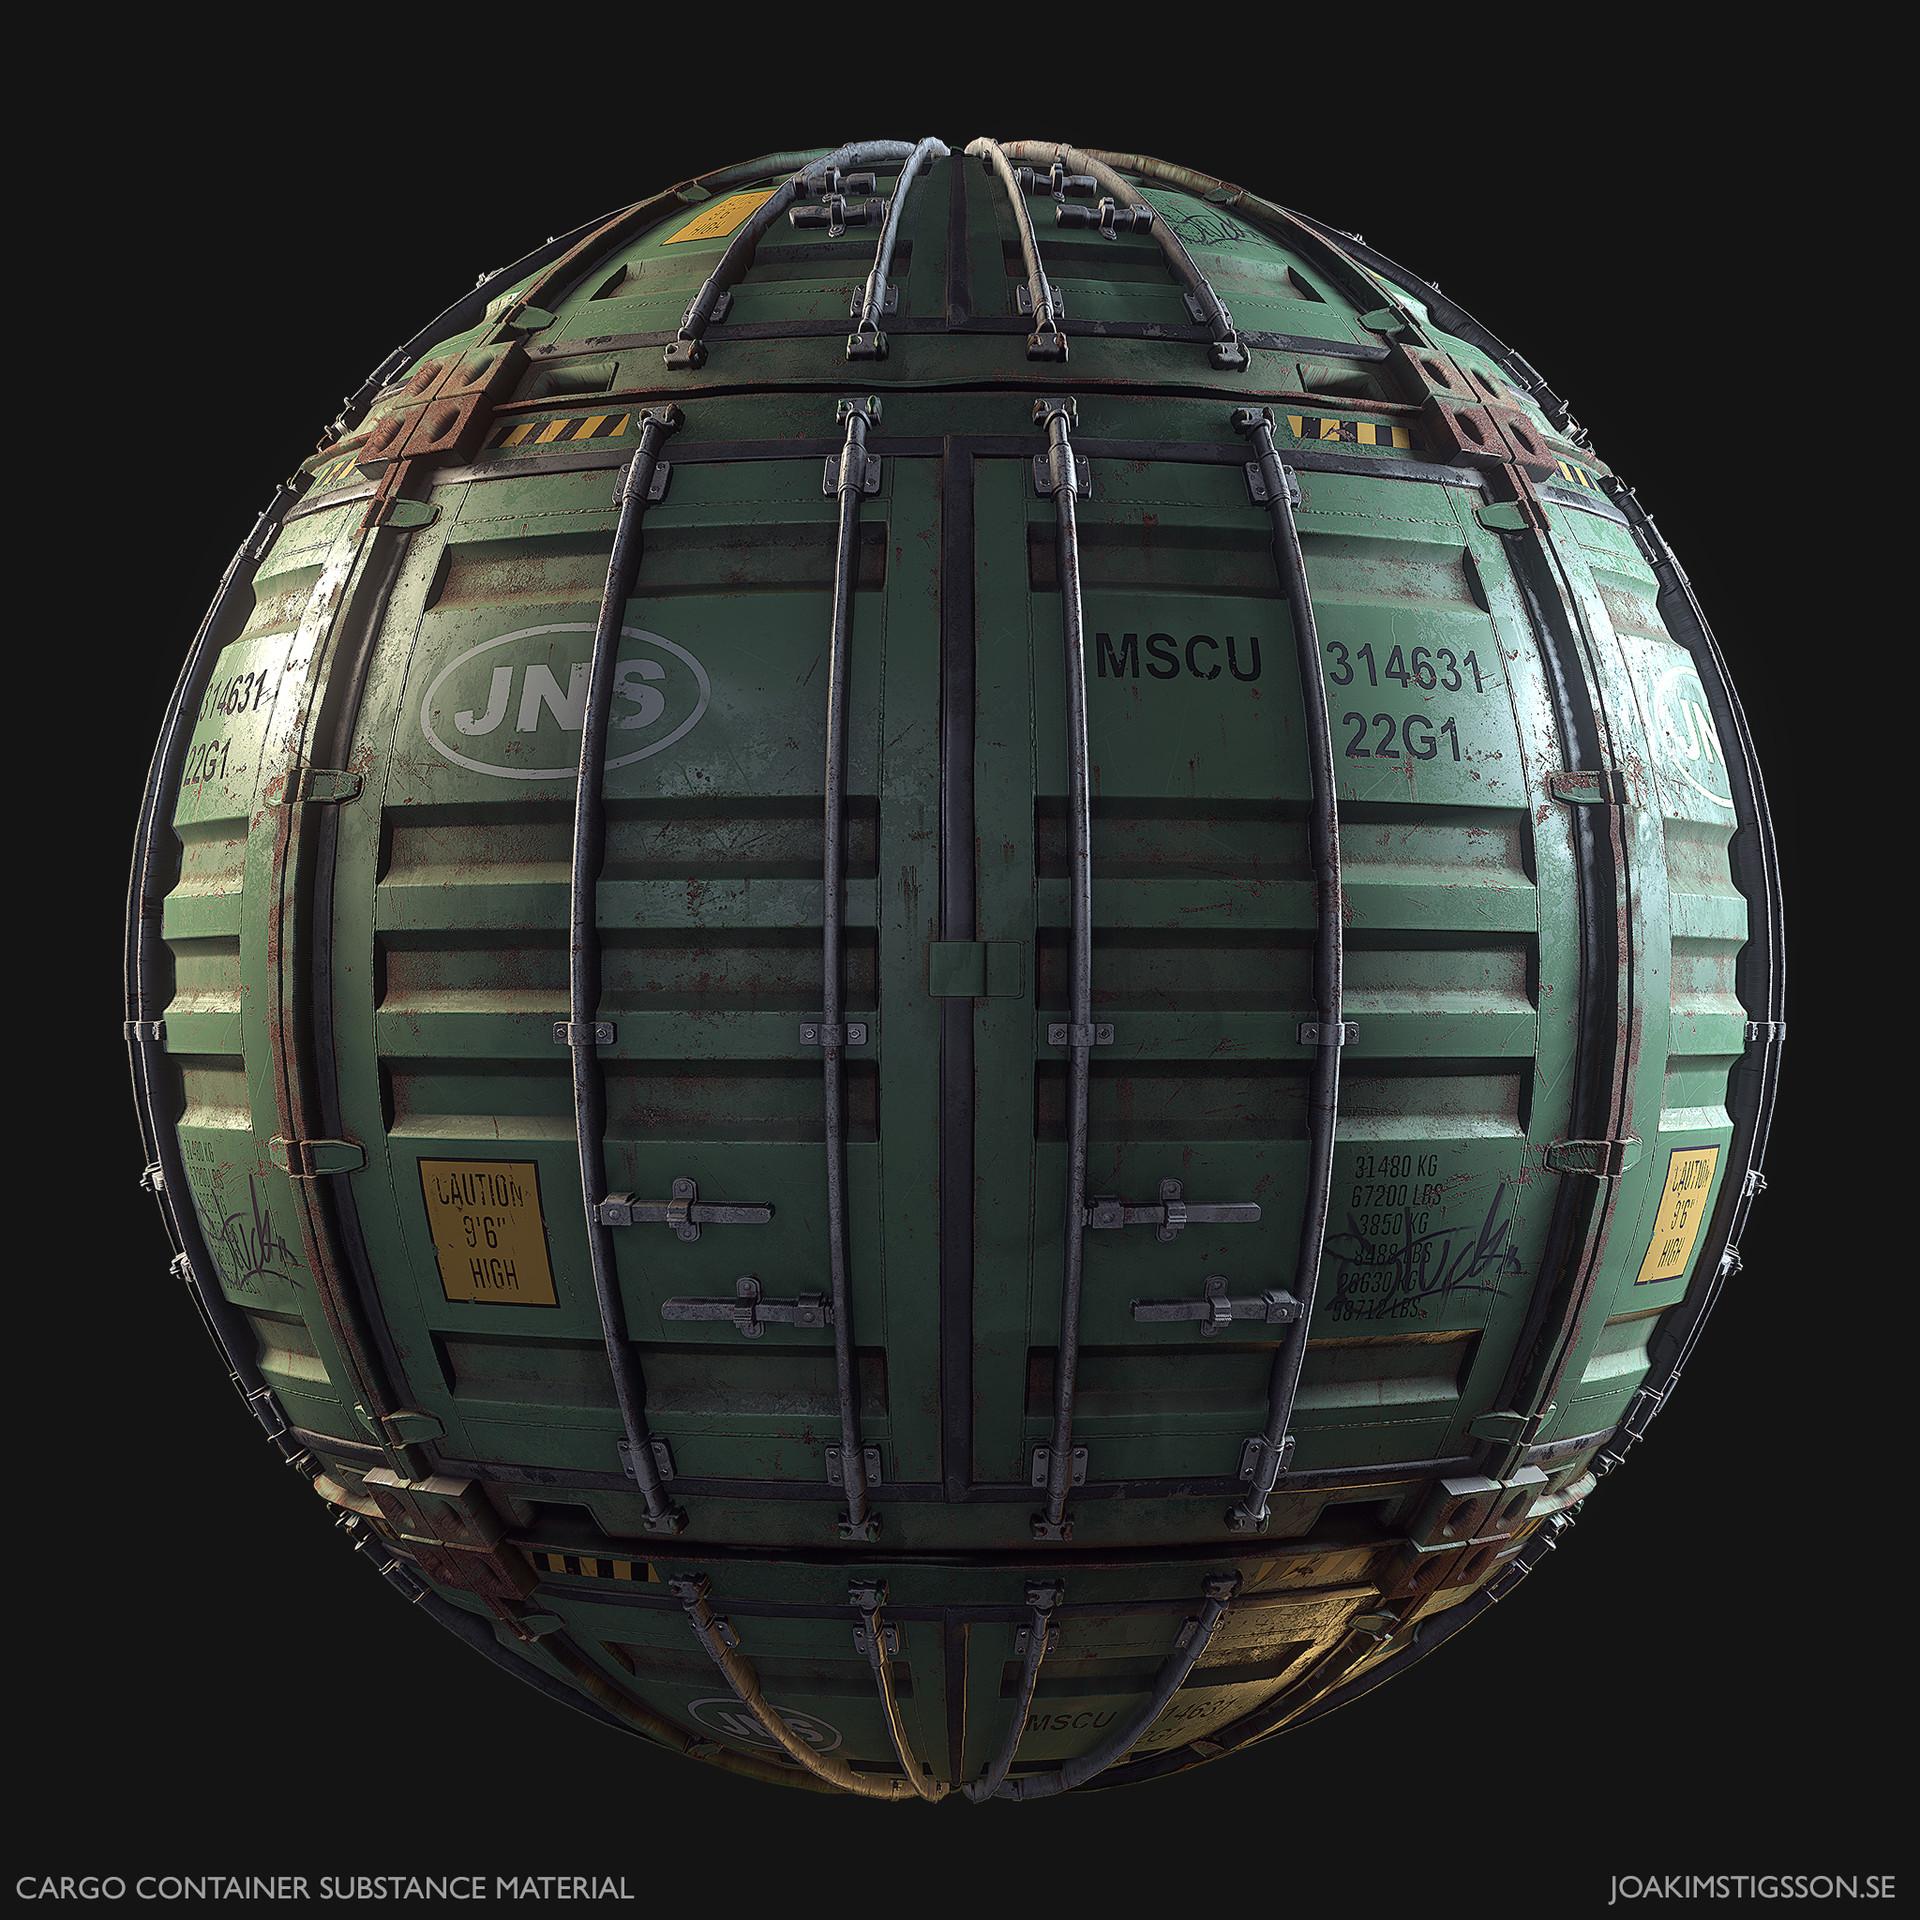 Joakim stigsson cargocontainer 01 sphere1